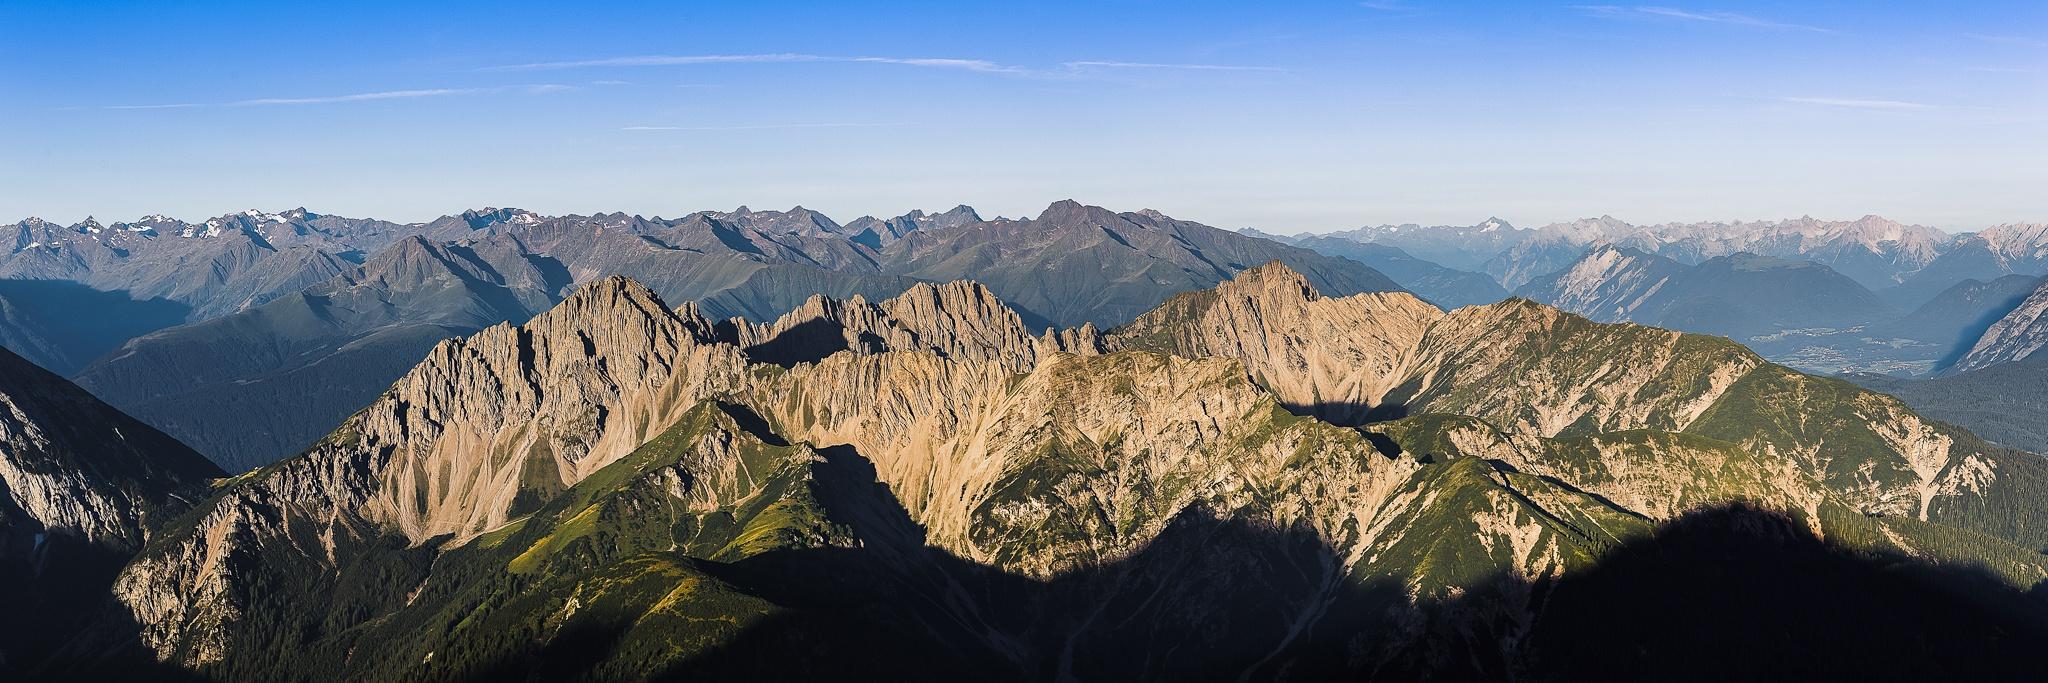 Erlspitze, Karwendel